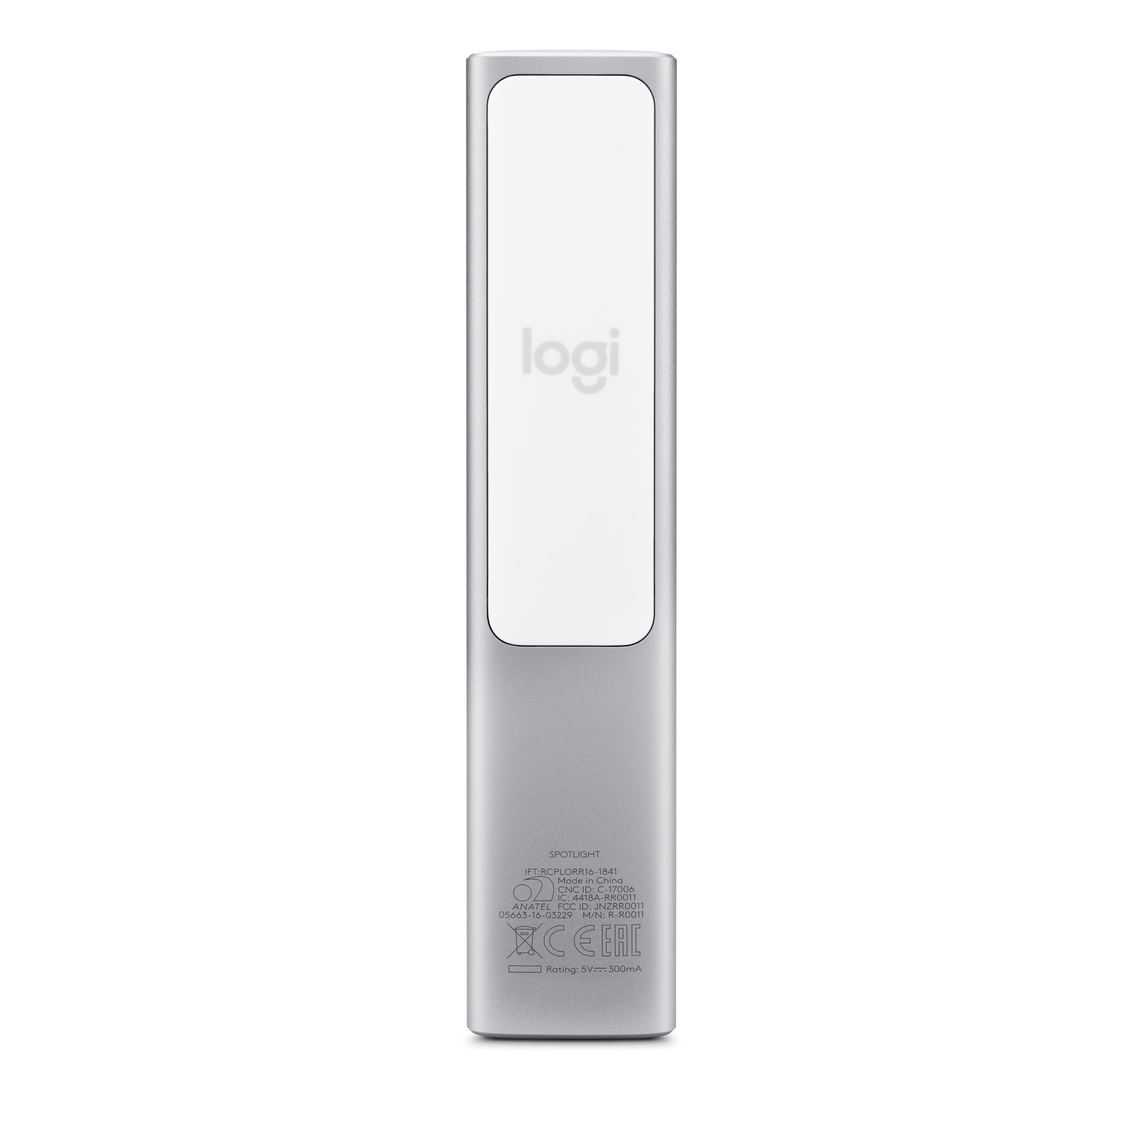 Logitech Spotlight Presentation Remote Apple